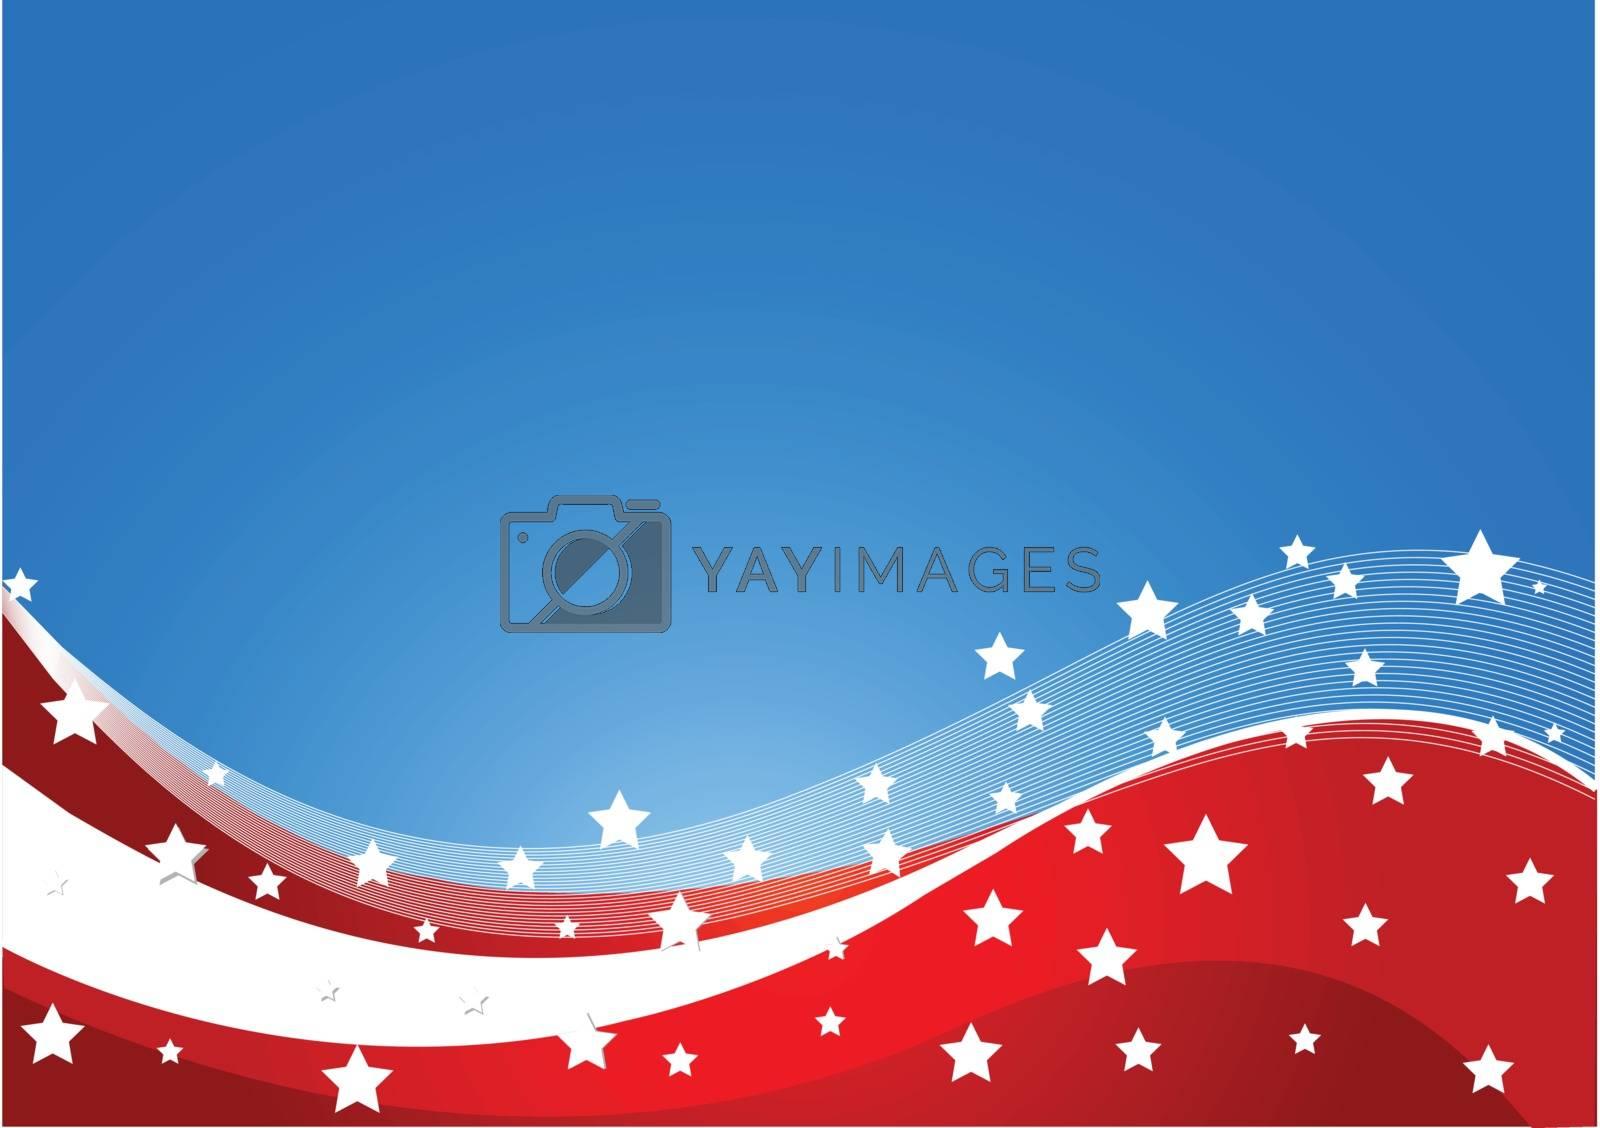 Royalty free image of USA flag theme by Dazdraperma